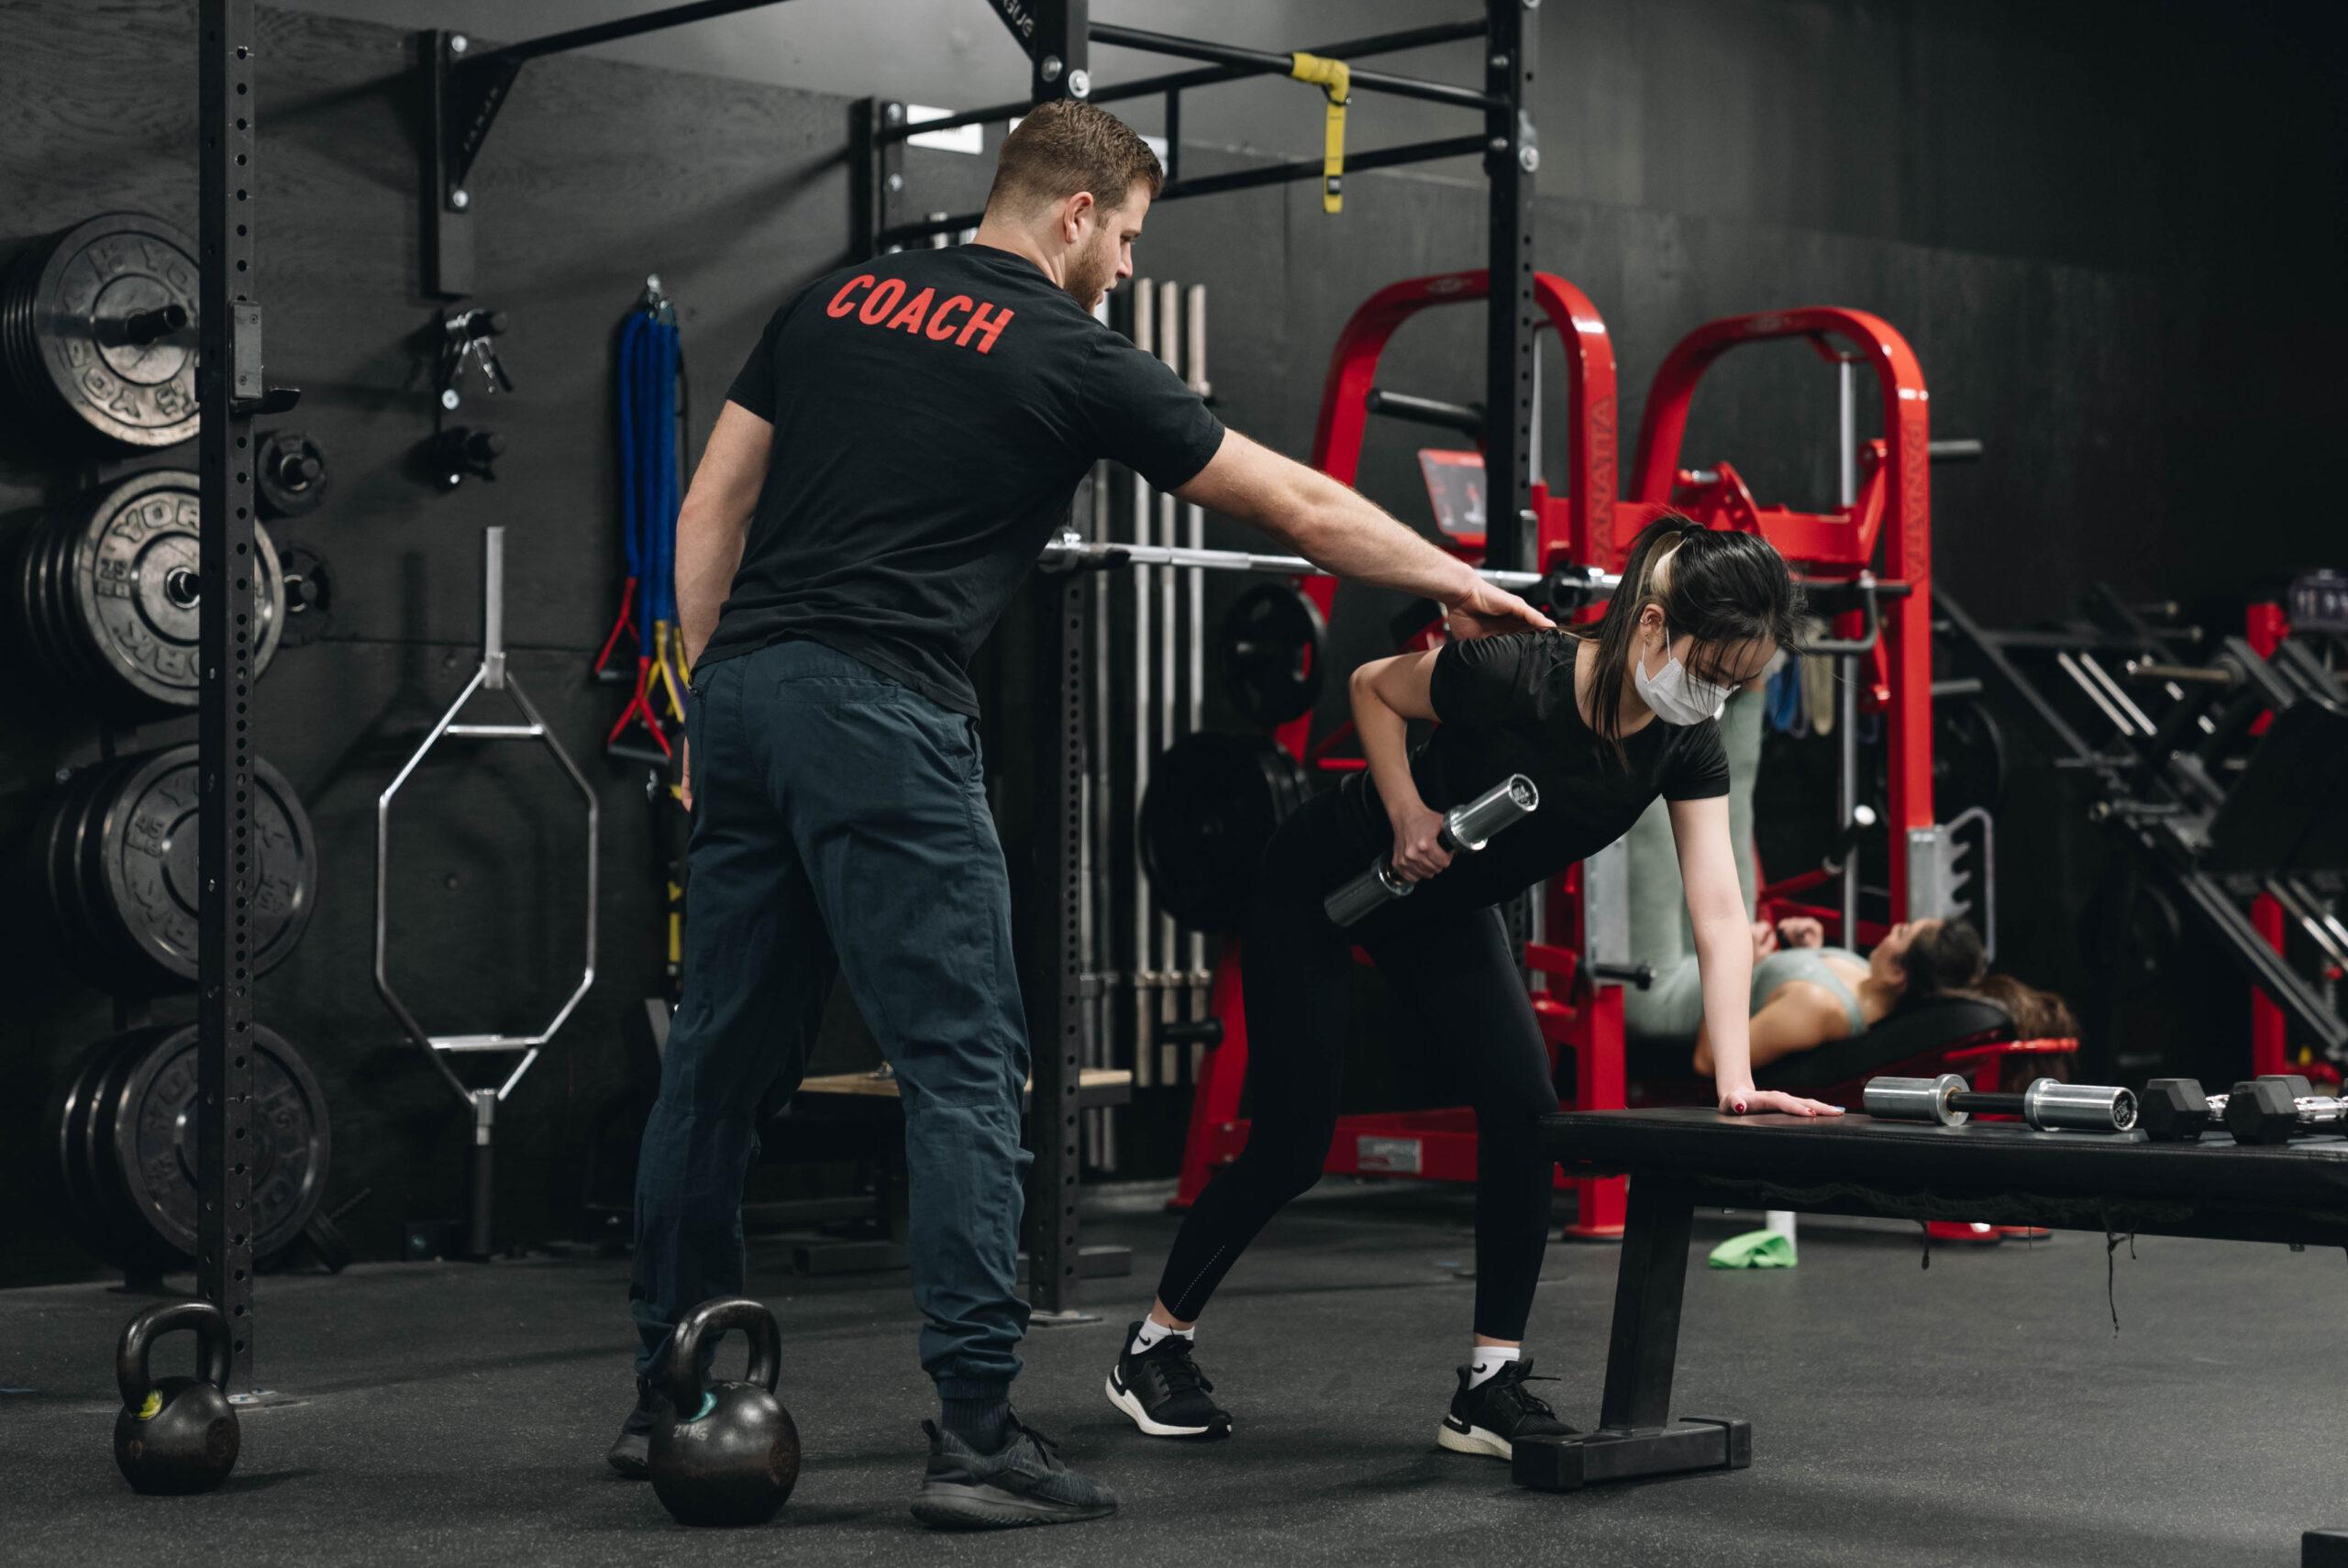 Gym in Virginia